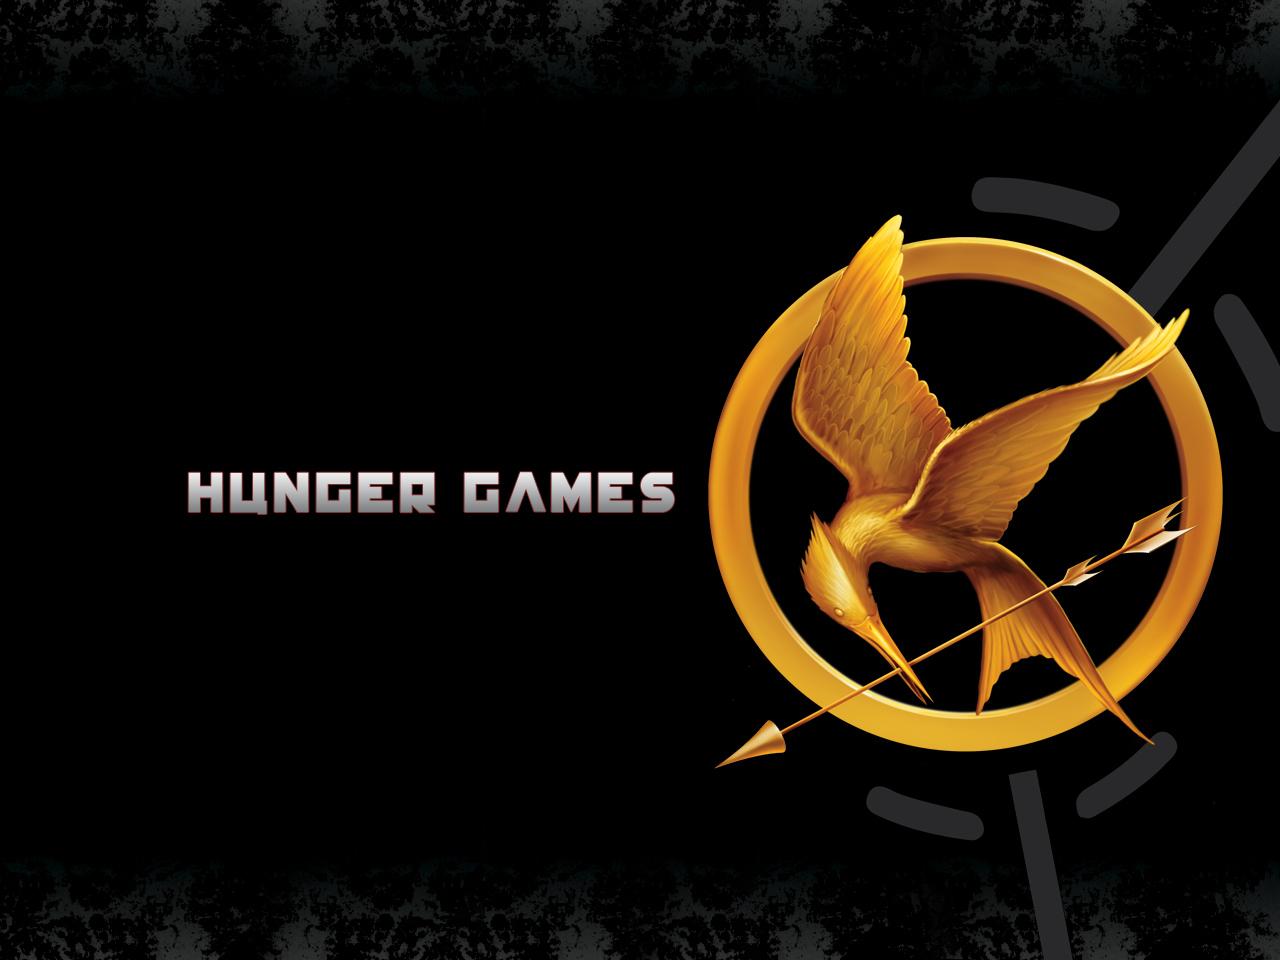 http://1.bp.blogspot.com/-oPgXoODQMTU/TsG2F3r6ztI/AAAAAAAADww/kzGki47KDrI/s1600/Hunger-Games-Wallpaper.jpg